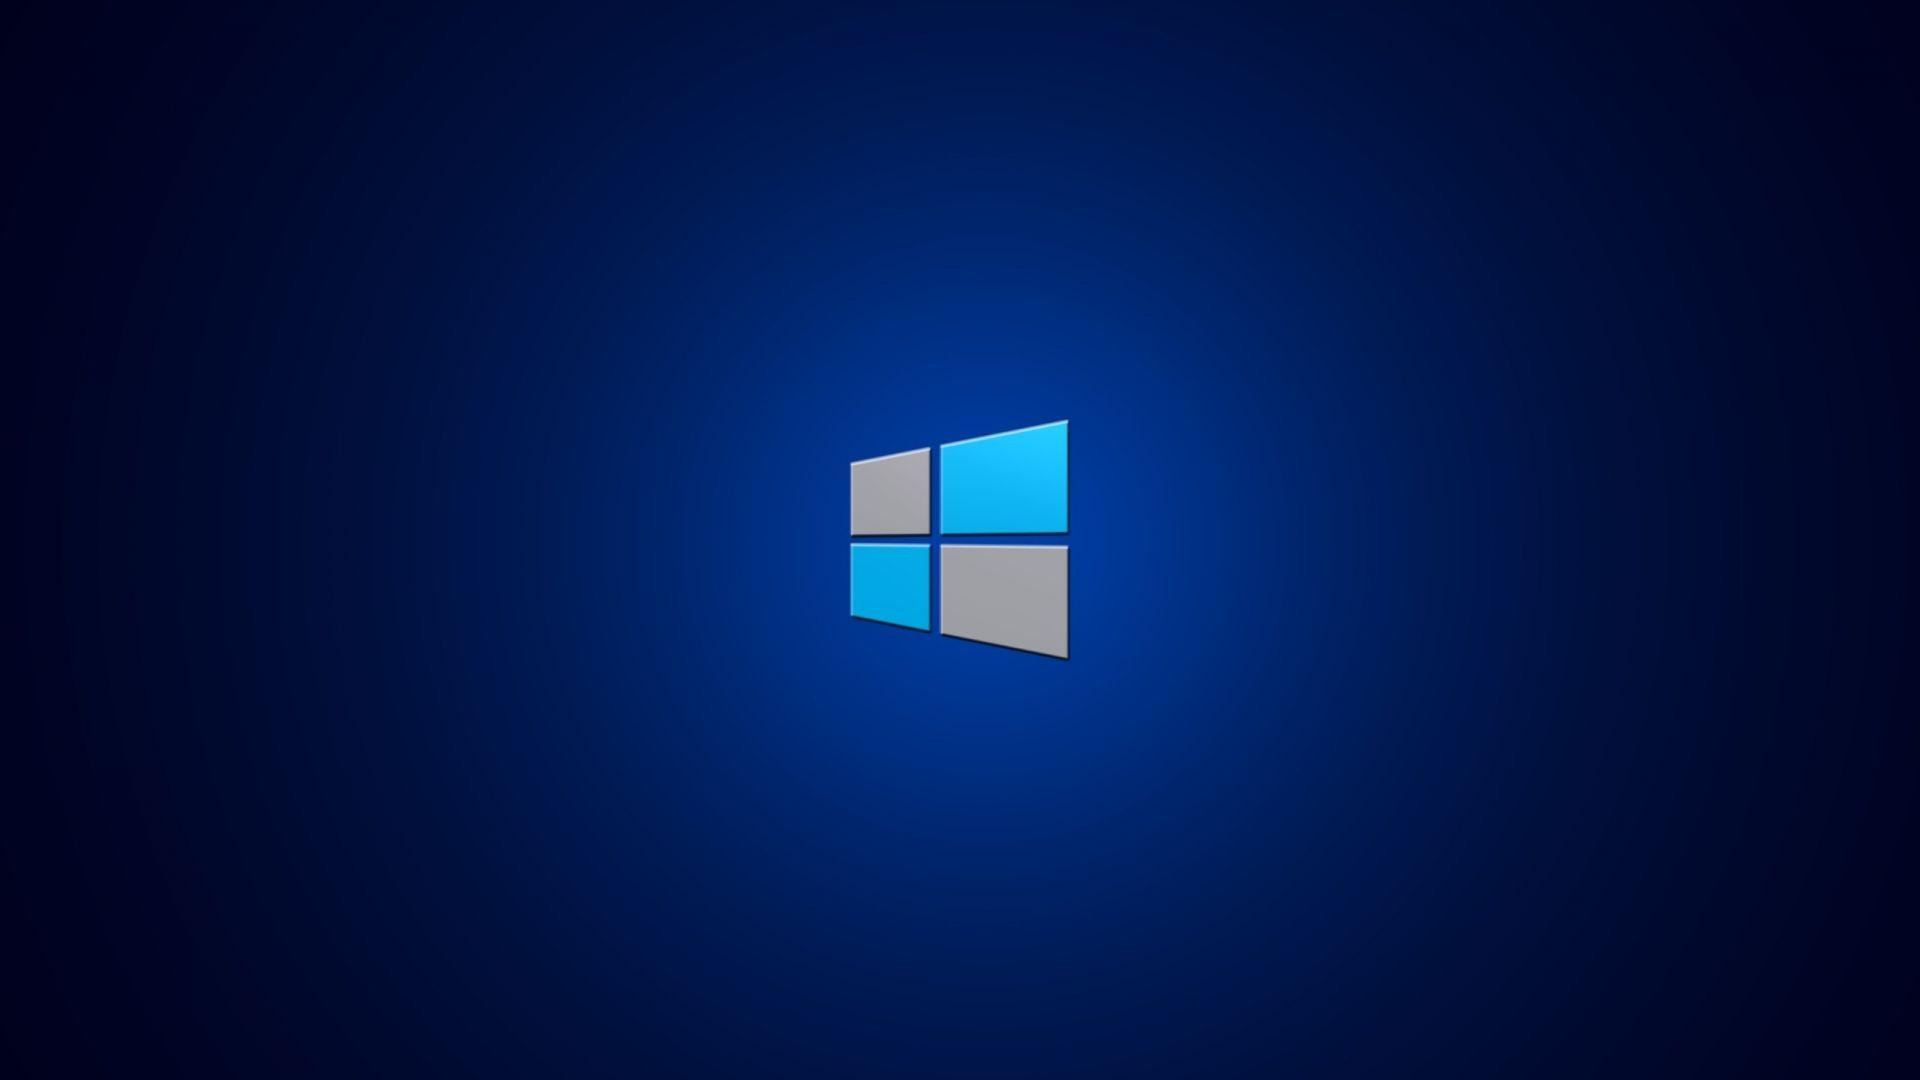 45 Mosaic Windows 8 Wallpapers   Download at WallpaperBro 1920x1080